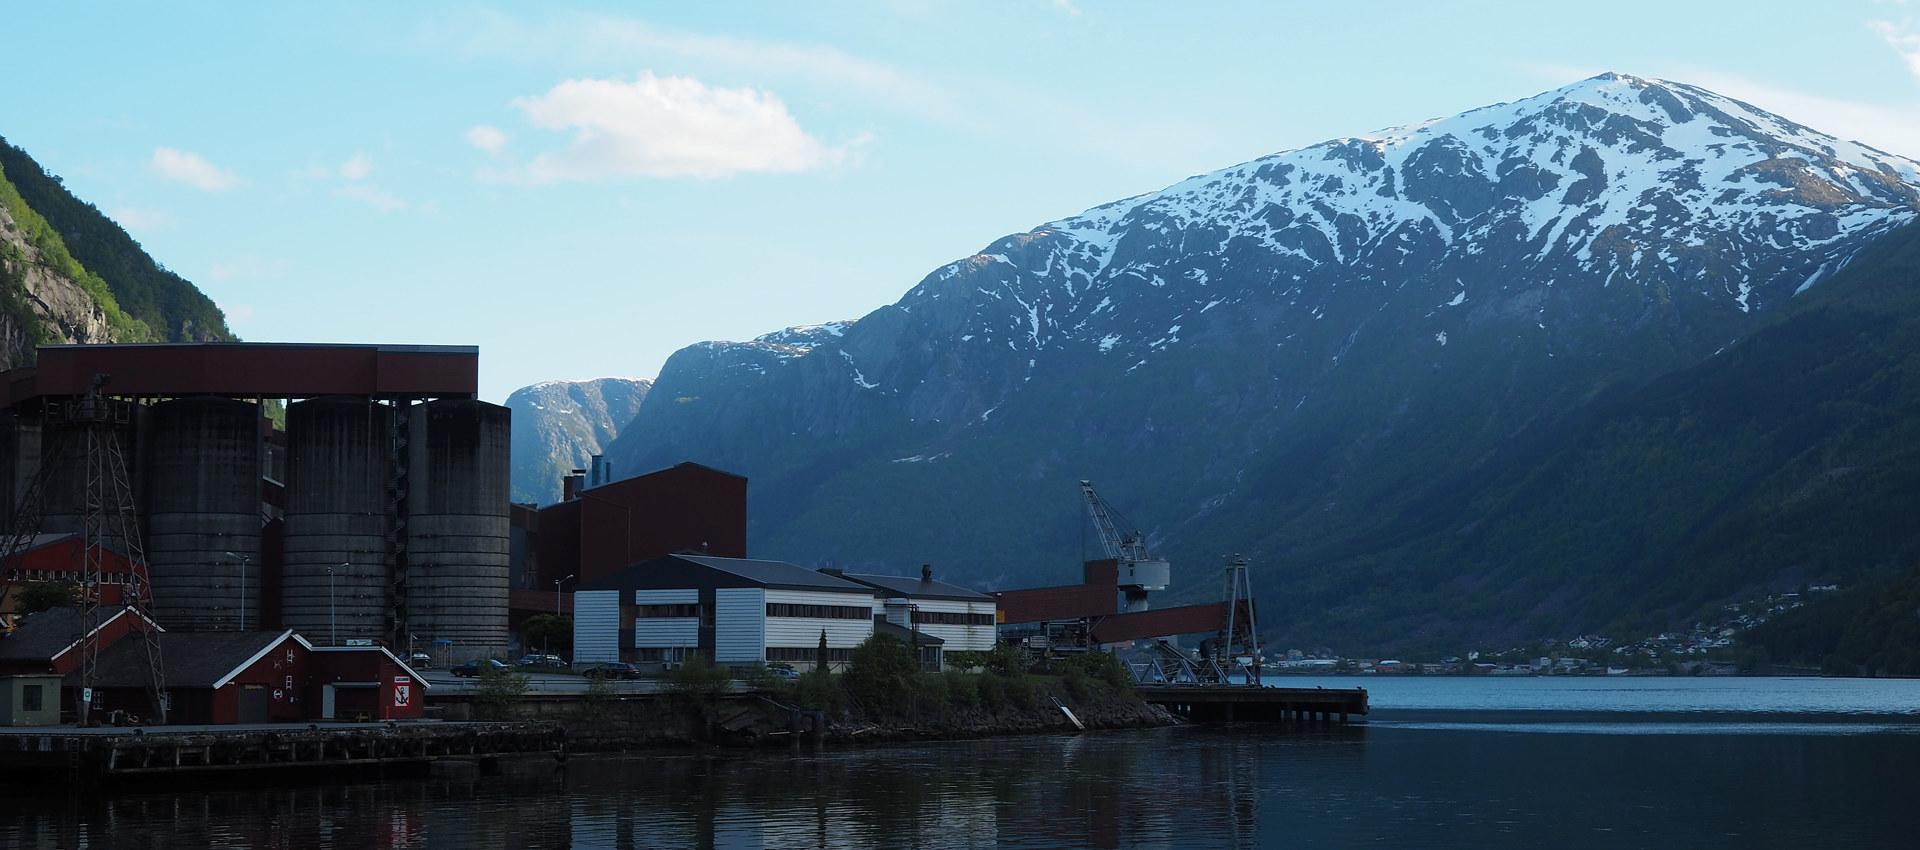 Fjord i Tyssedal